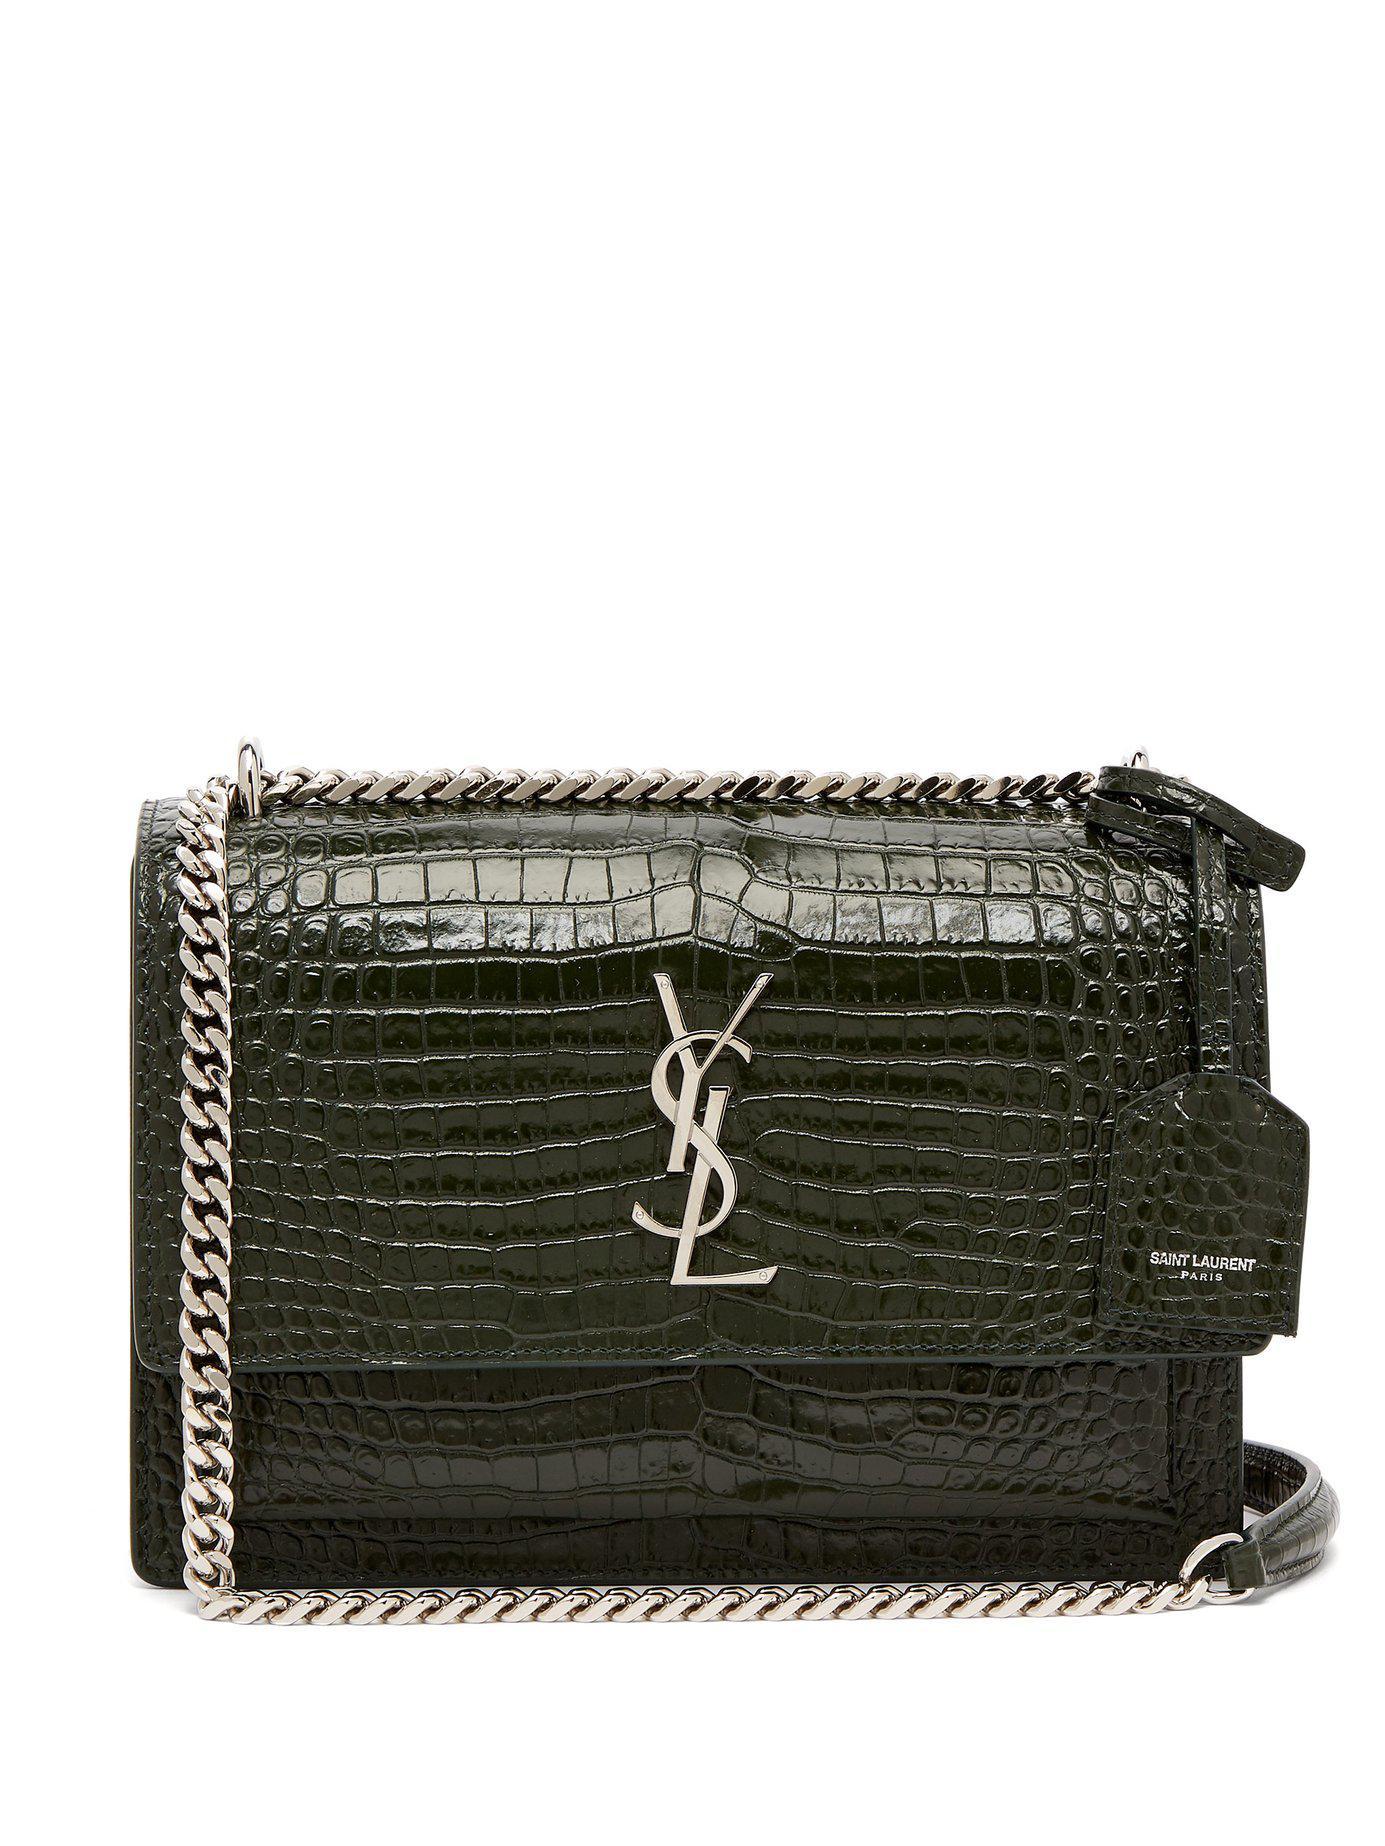 78be20de7 Saint Laurent Sunset Medium Crocodile-effect Leather Bag in Green - Lyst